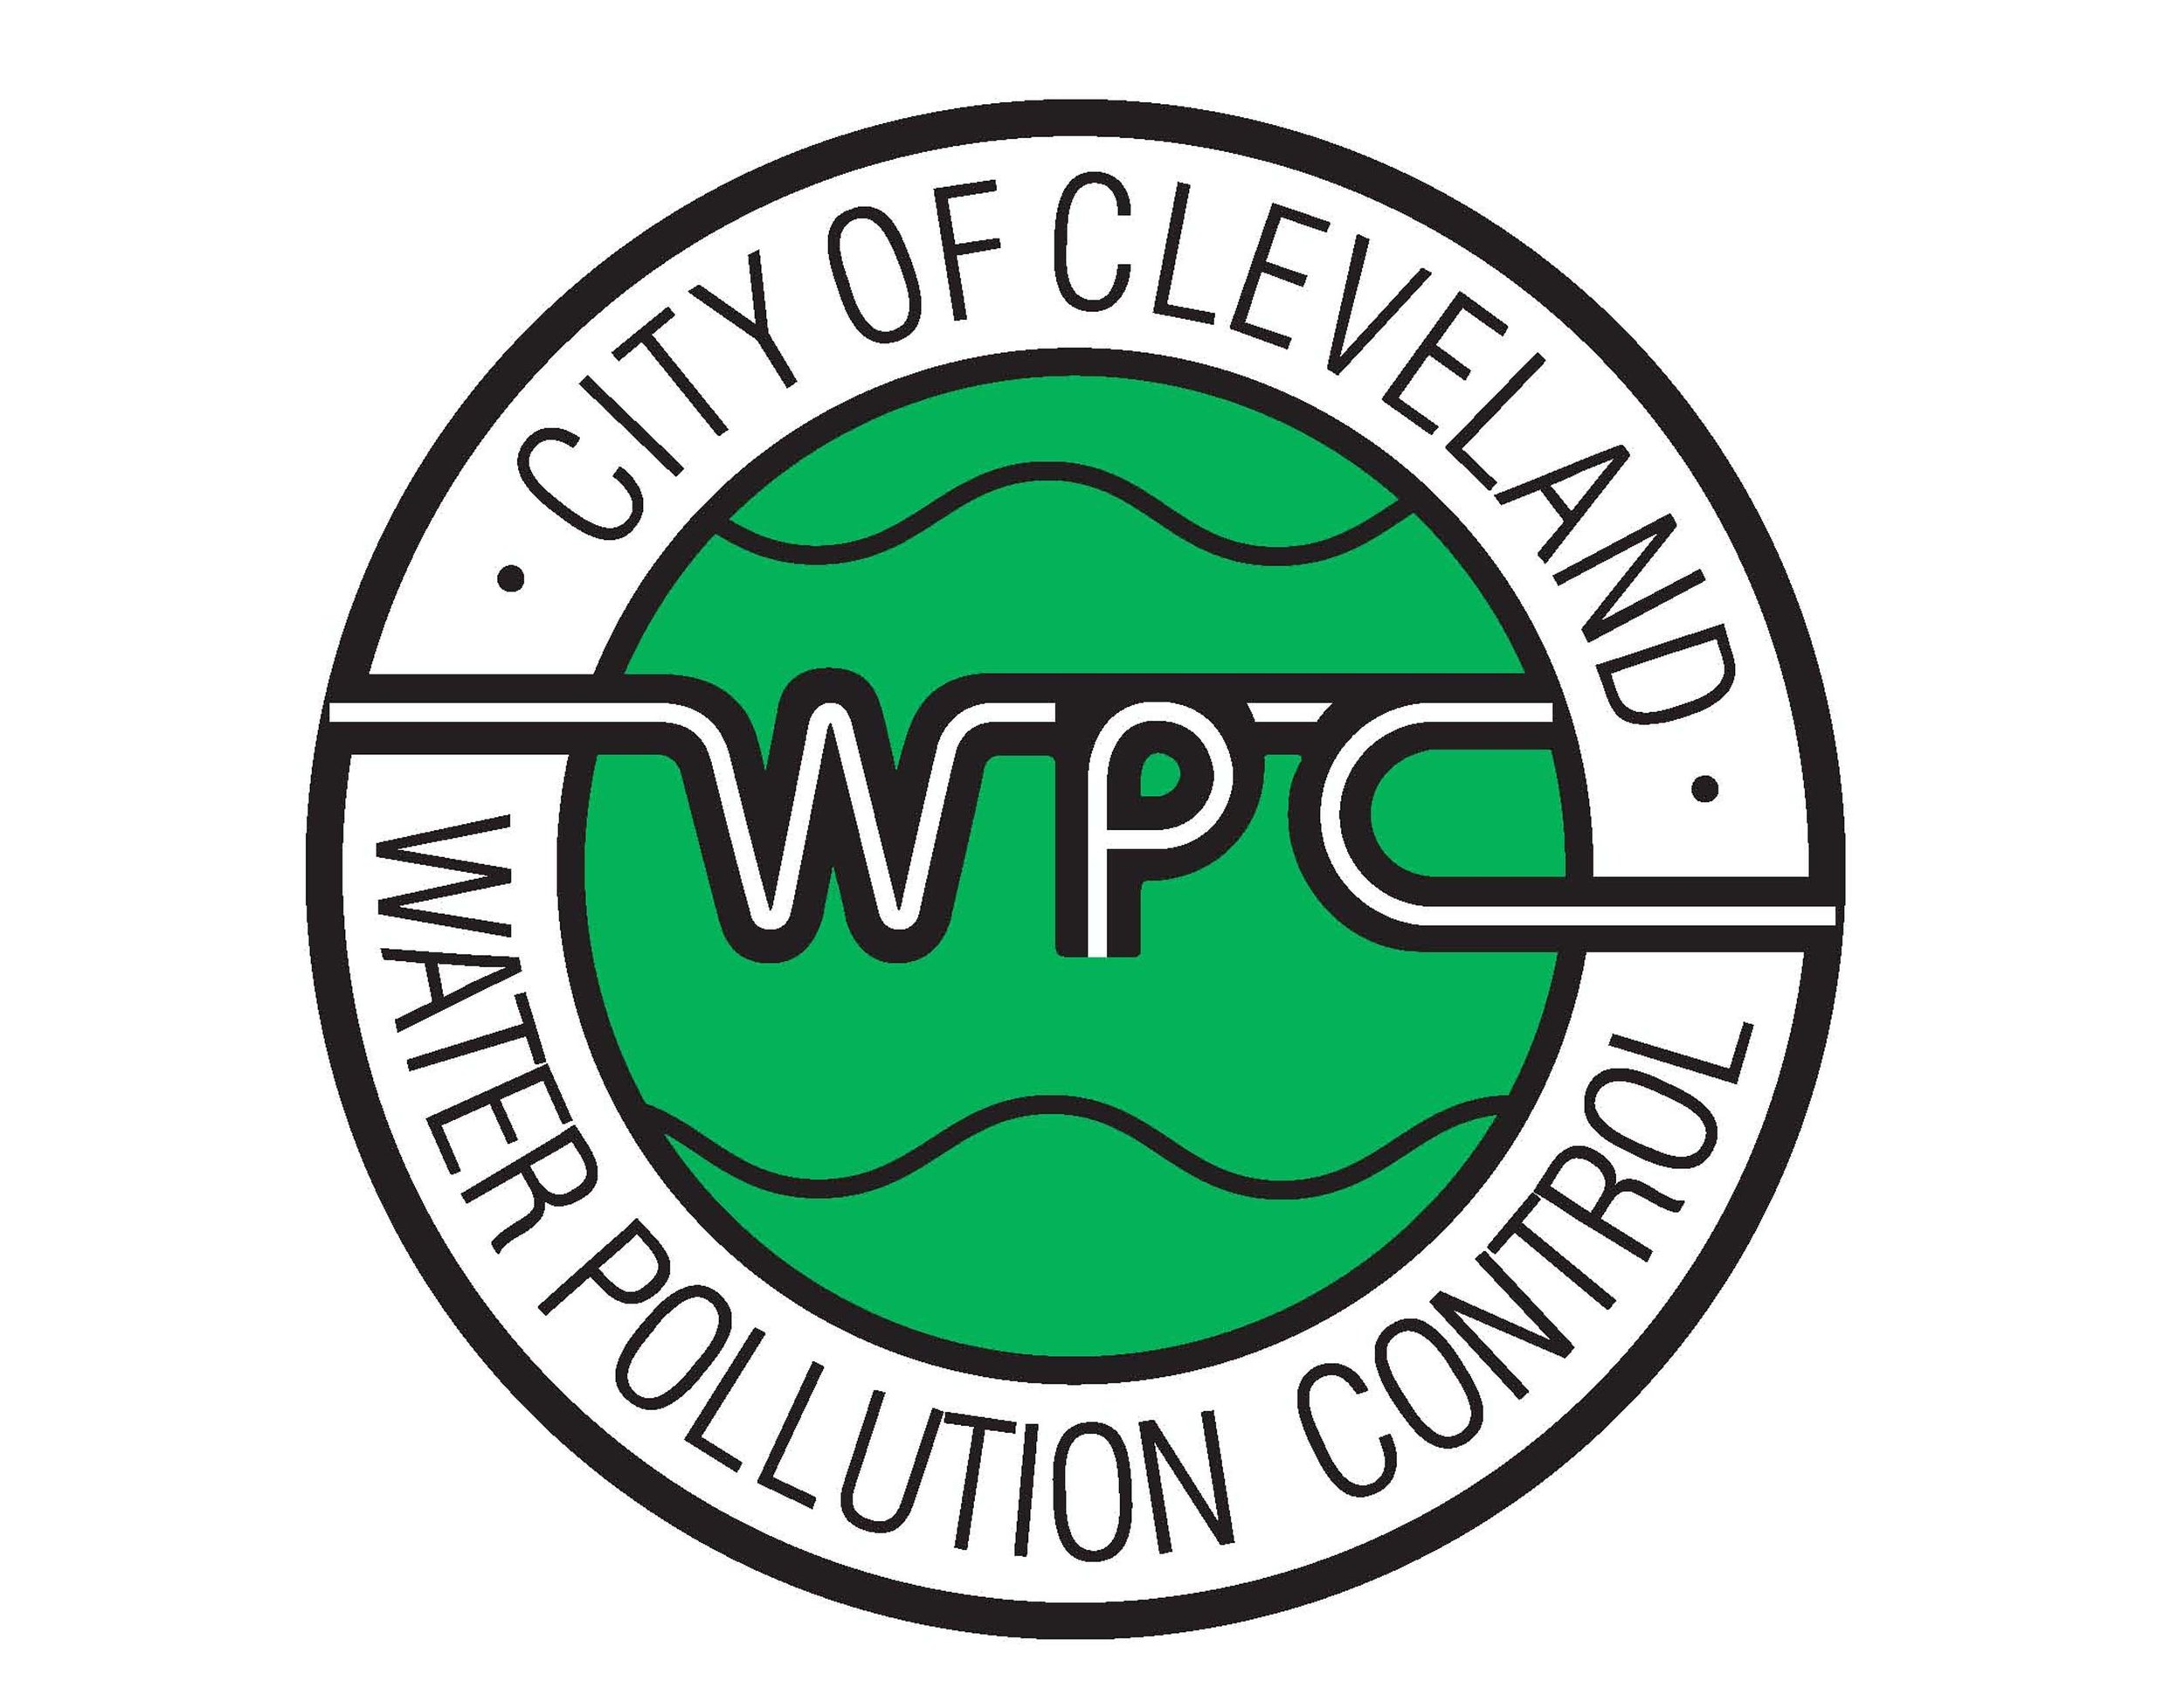 Water Pollution Control_logo.JPG